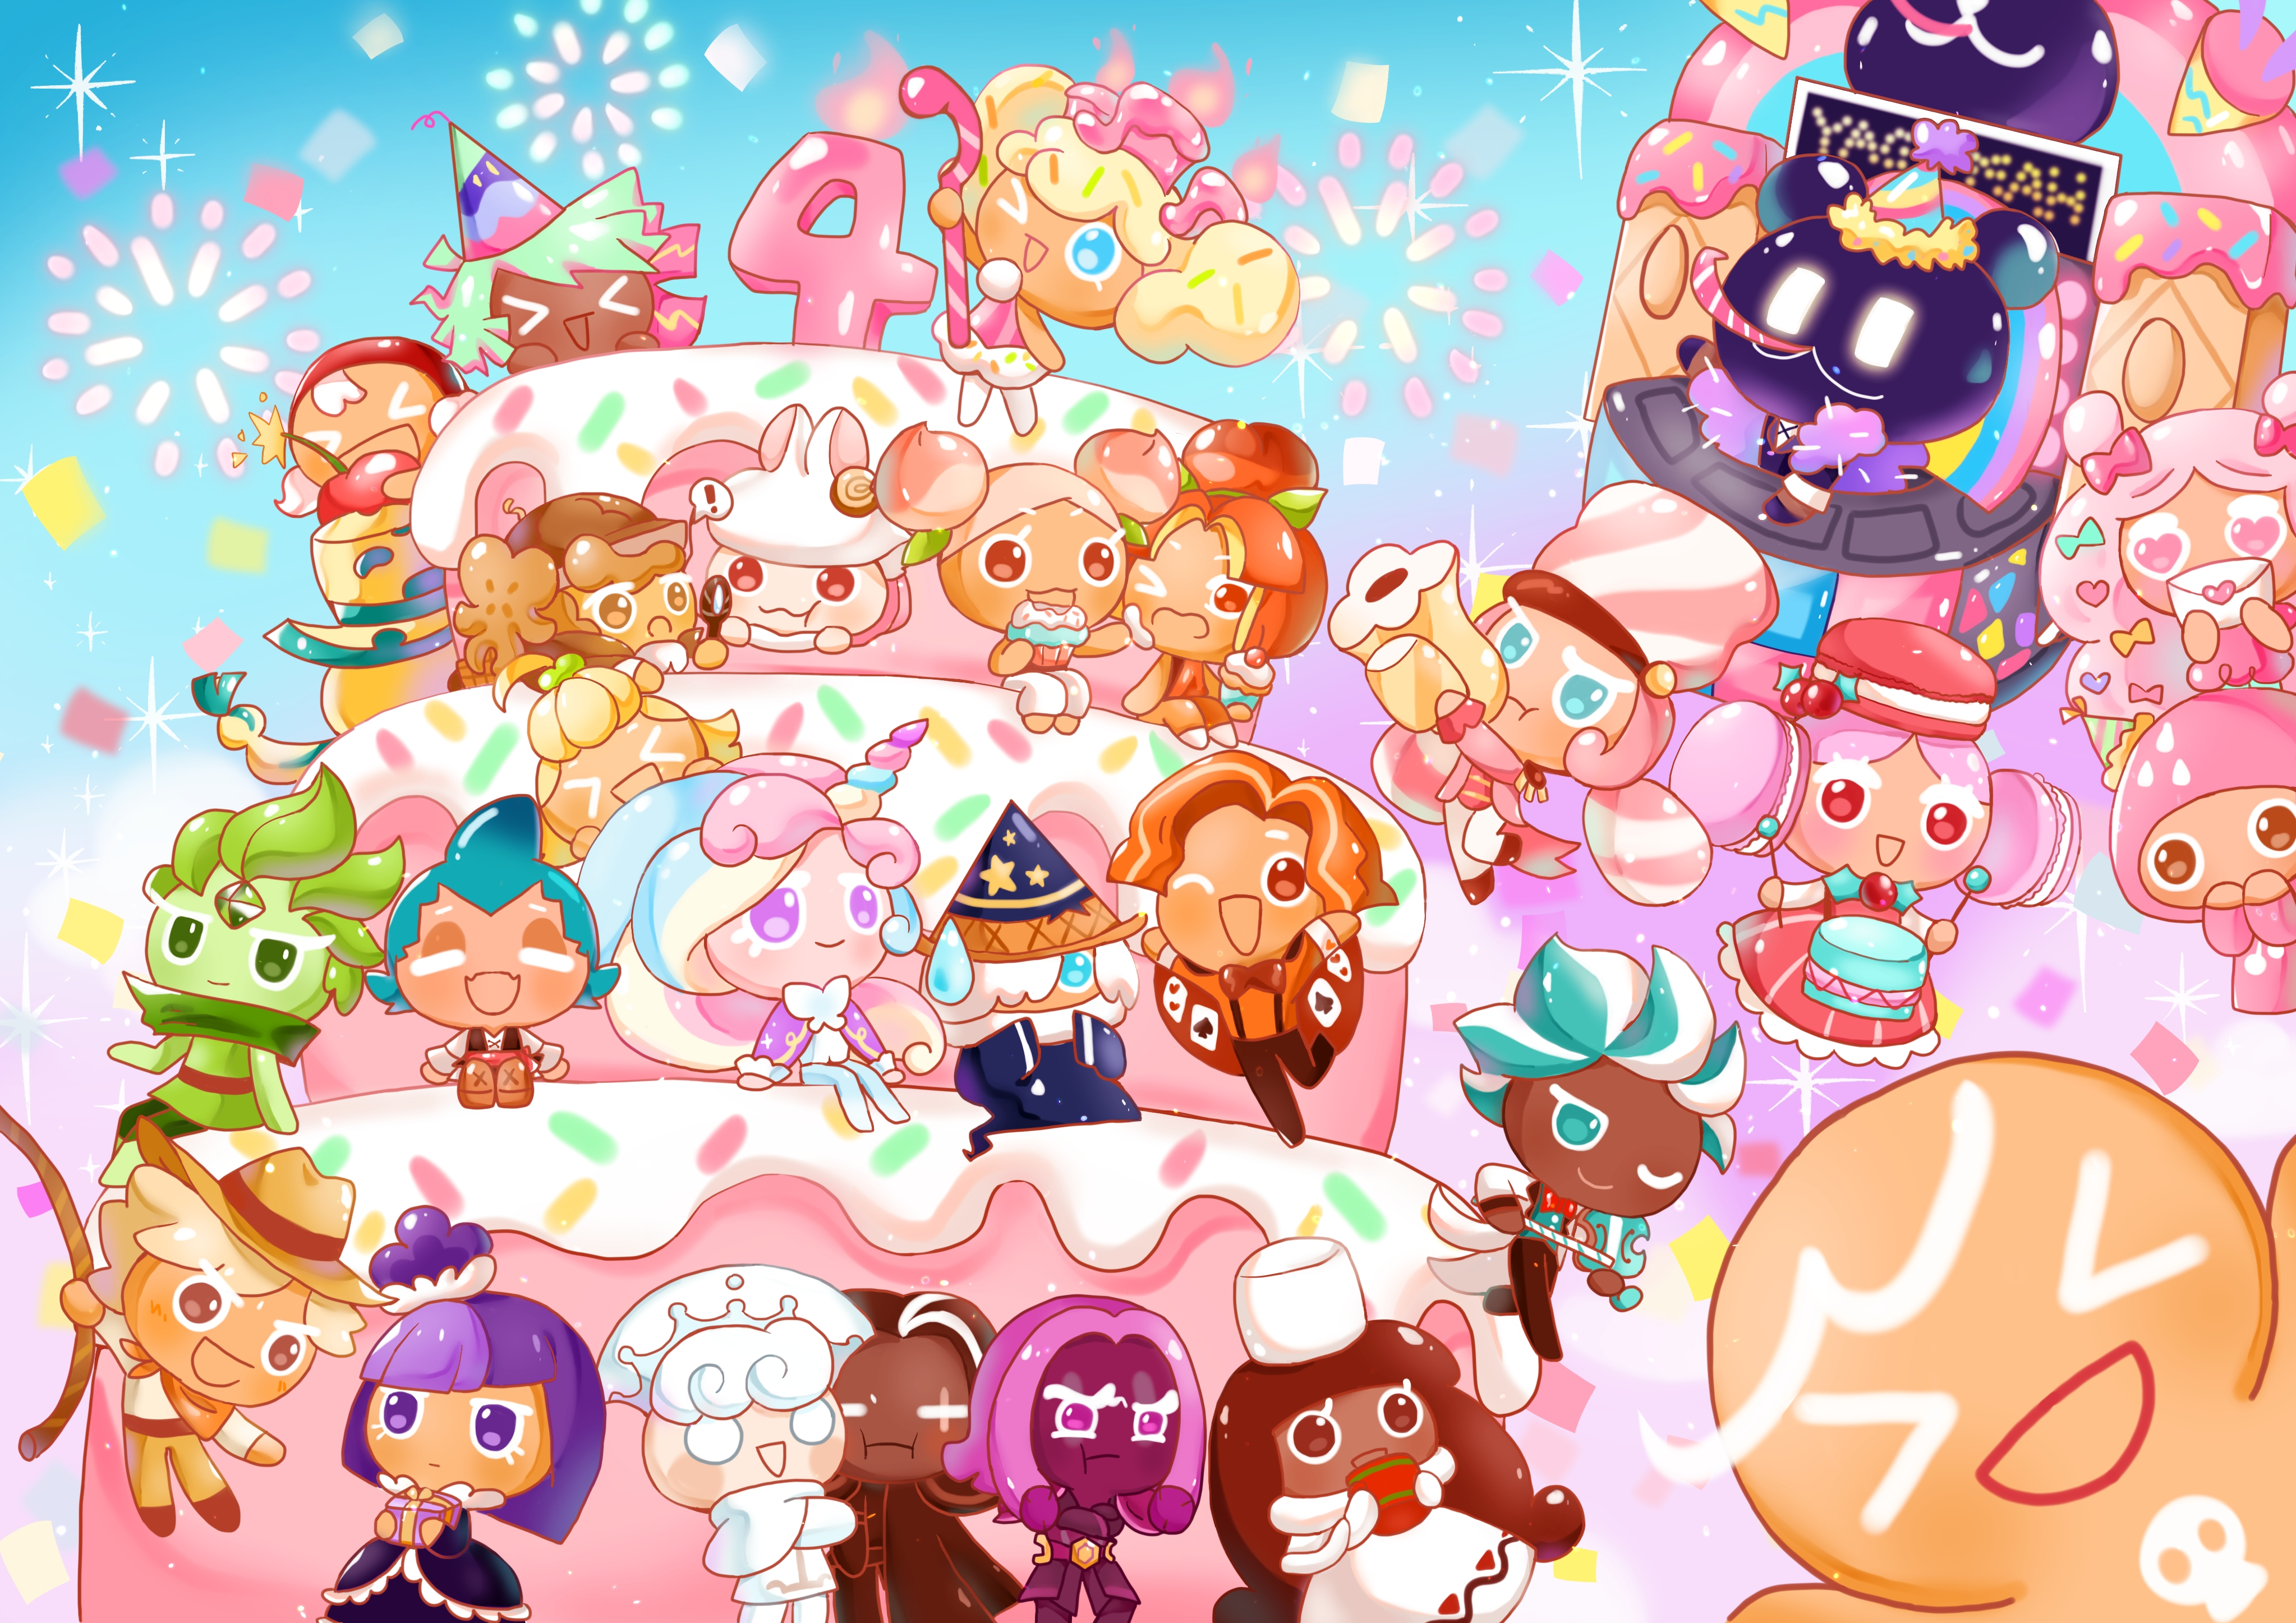 Moon Rabbit Cookie   Cookie Run   Zerochan Anime Image Board 4093x2894